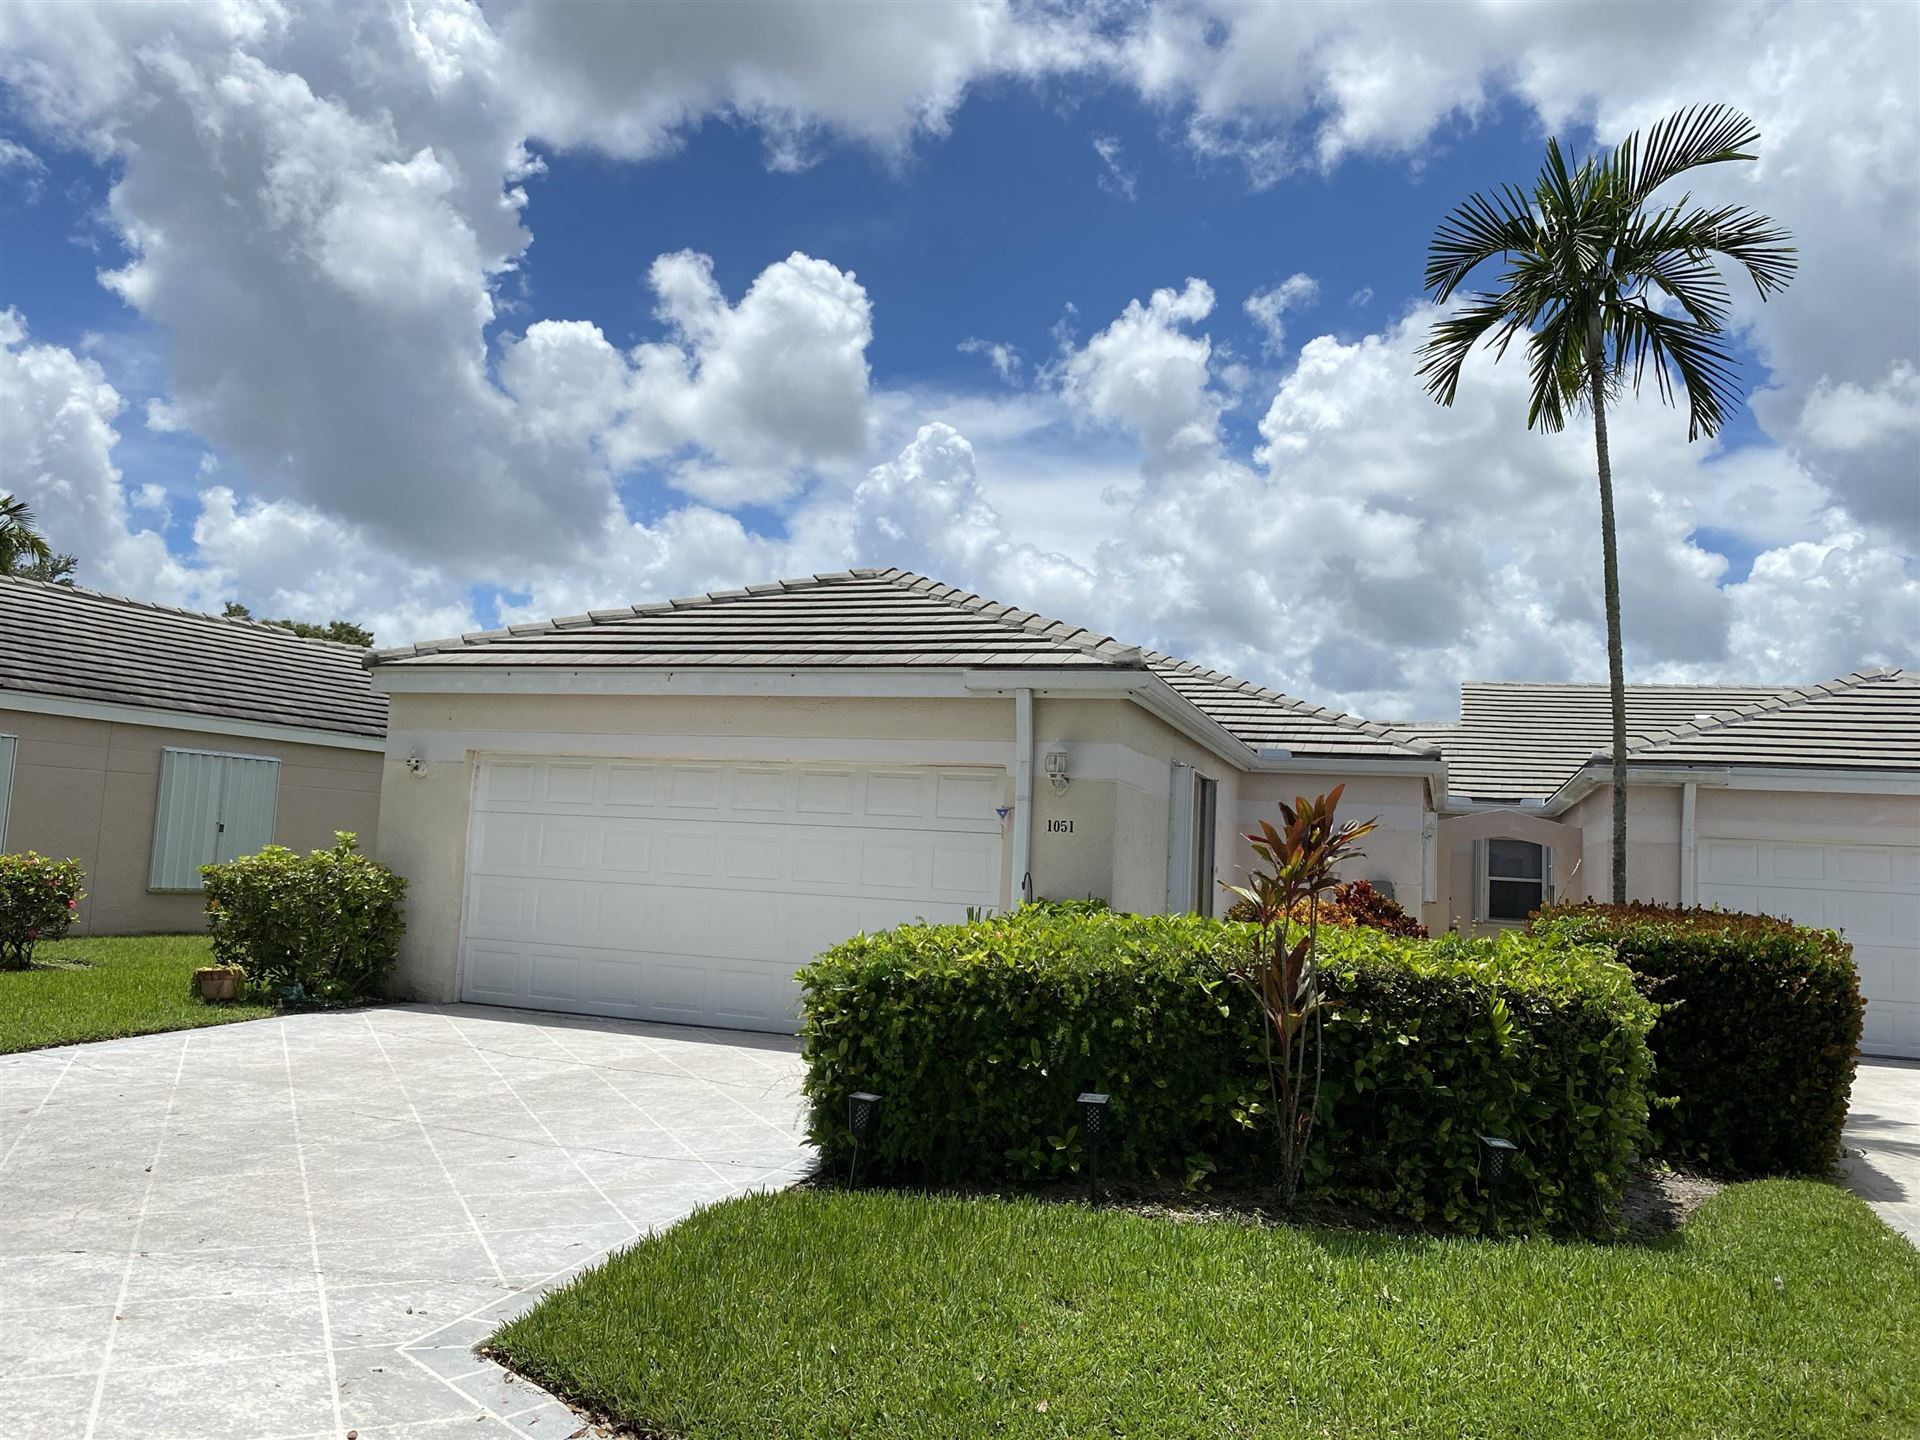 Photo of 1051 Island Manor Drive, Greenacres, FL 33413 (MLS # RX-10646785)